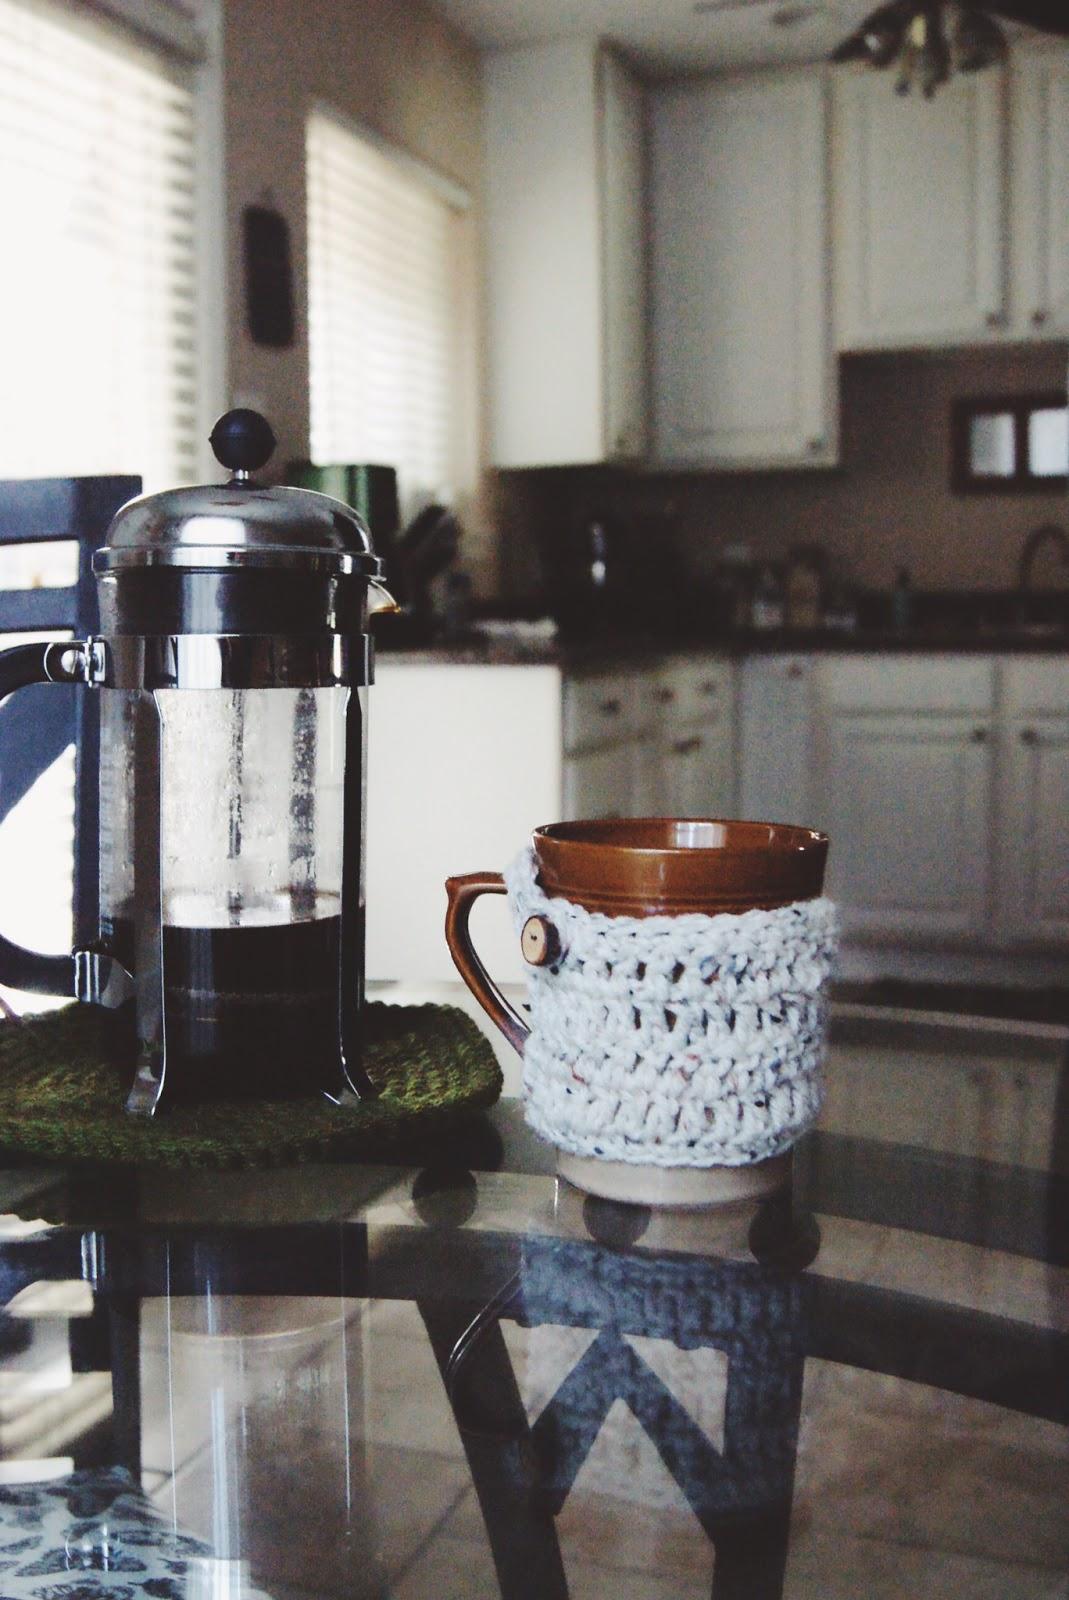 Crocheted Cozy Mug